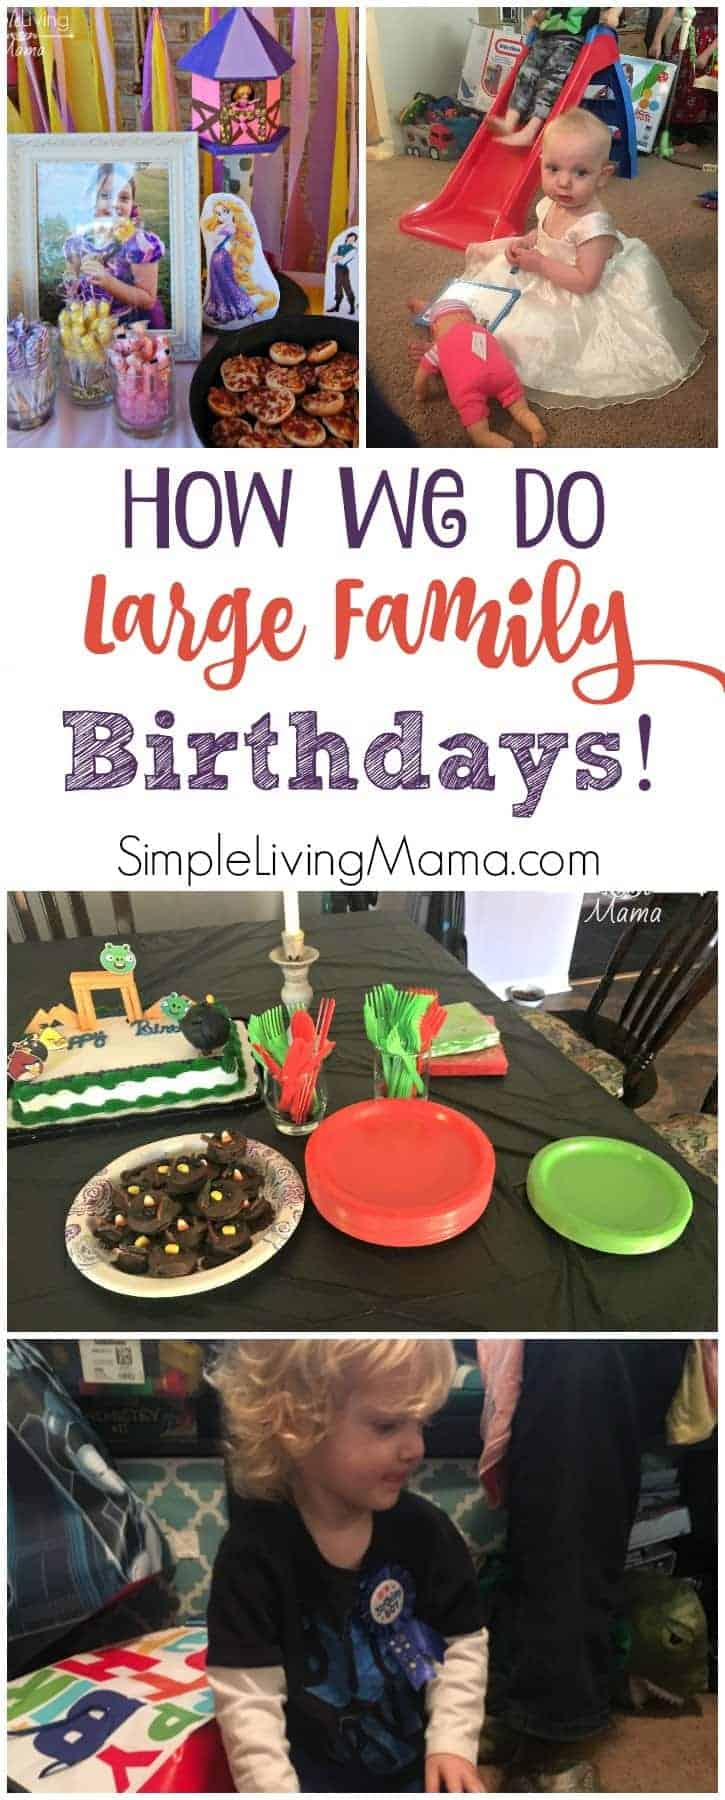 How we do large family birthdays